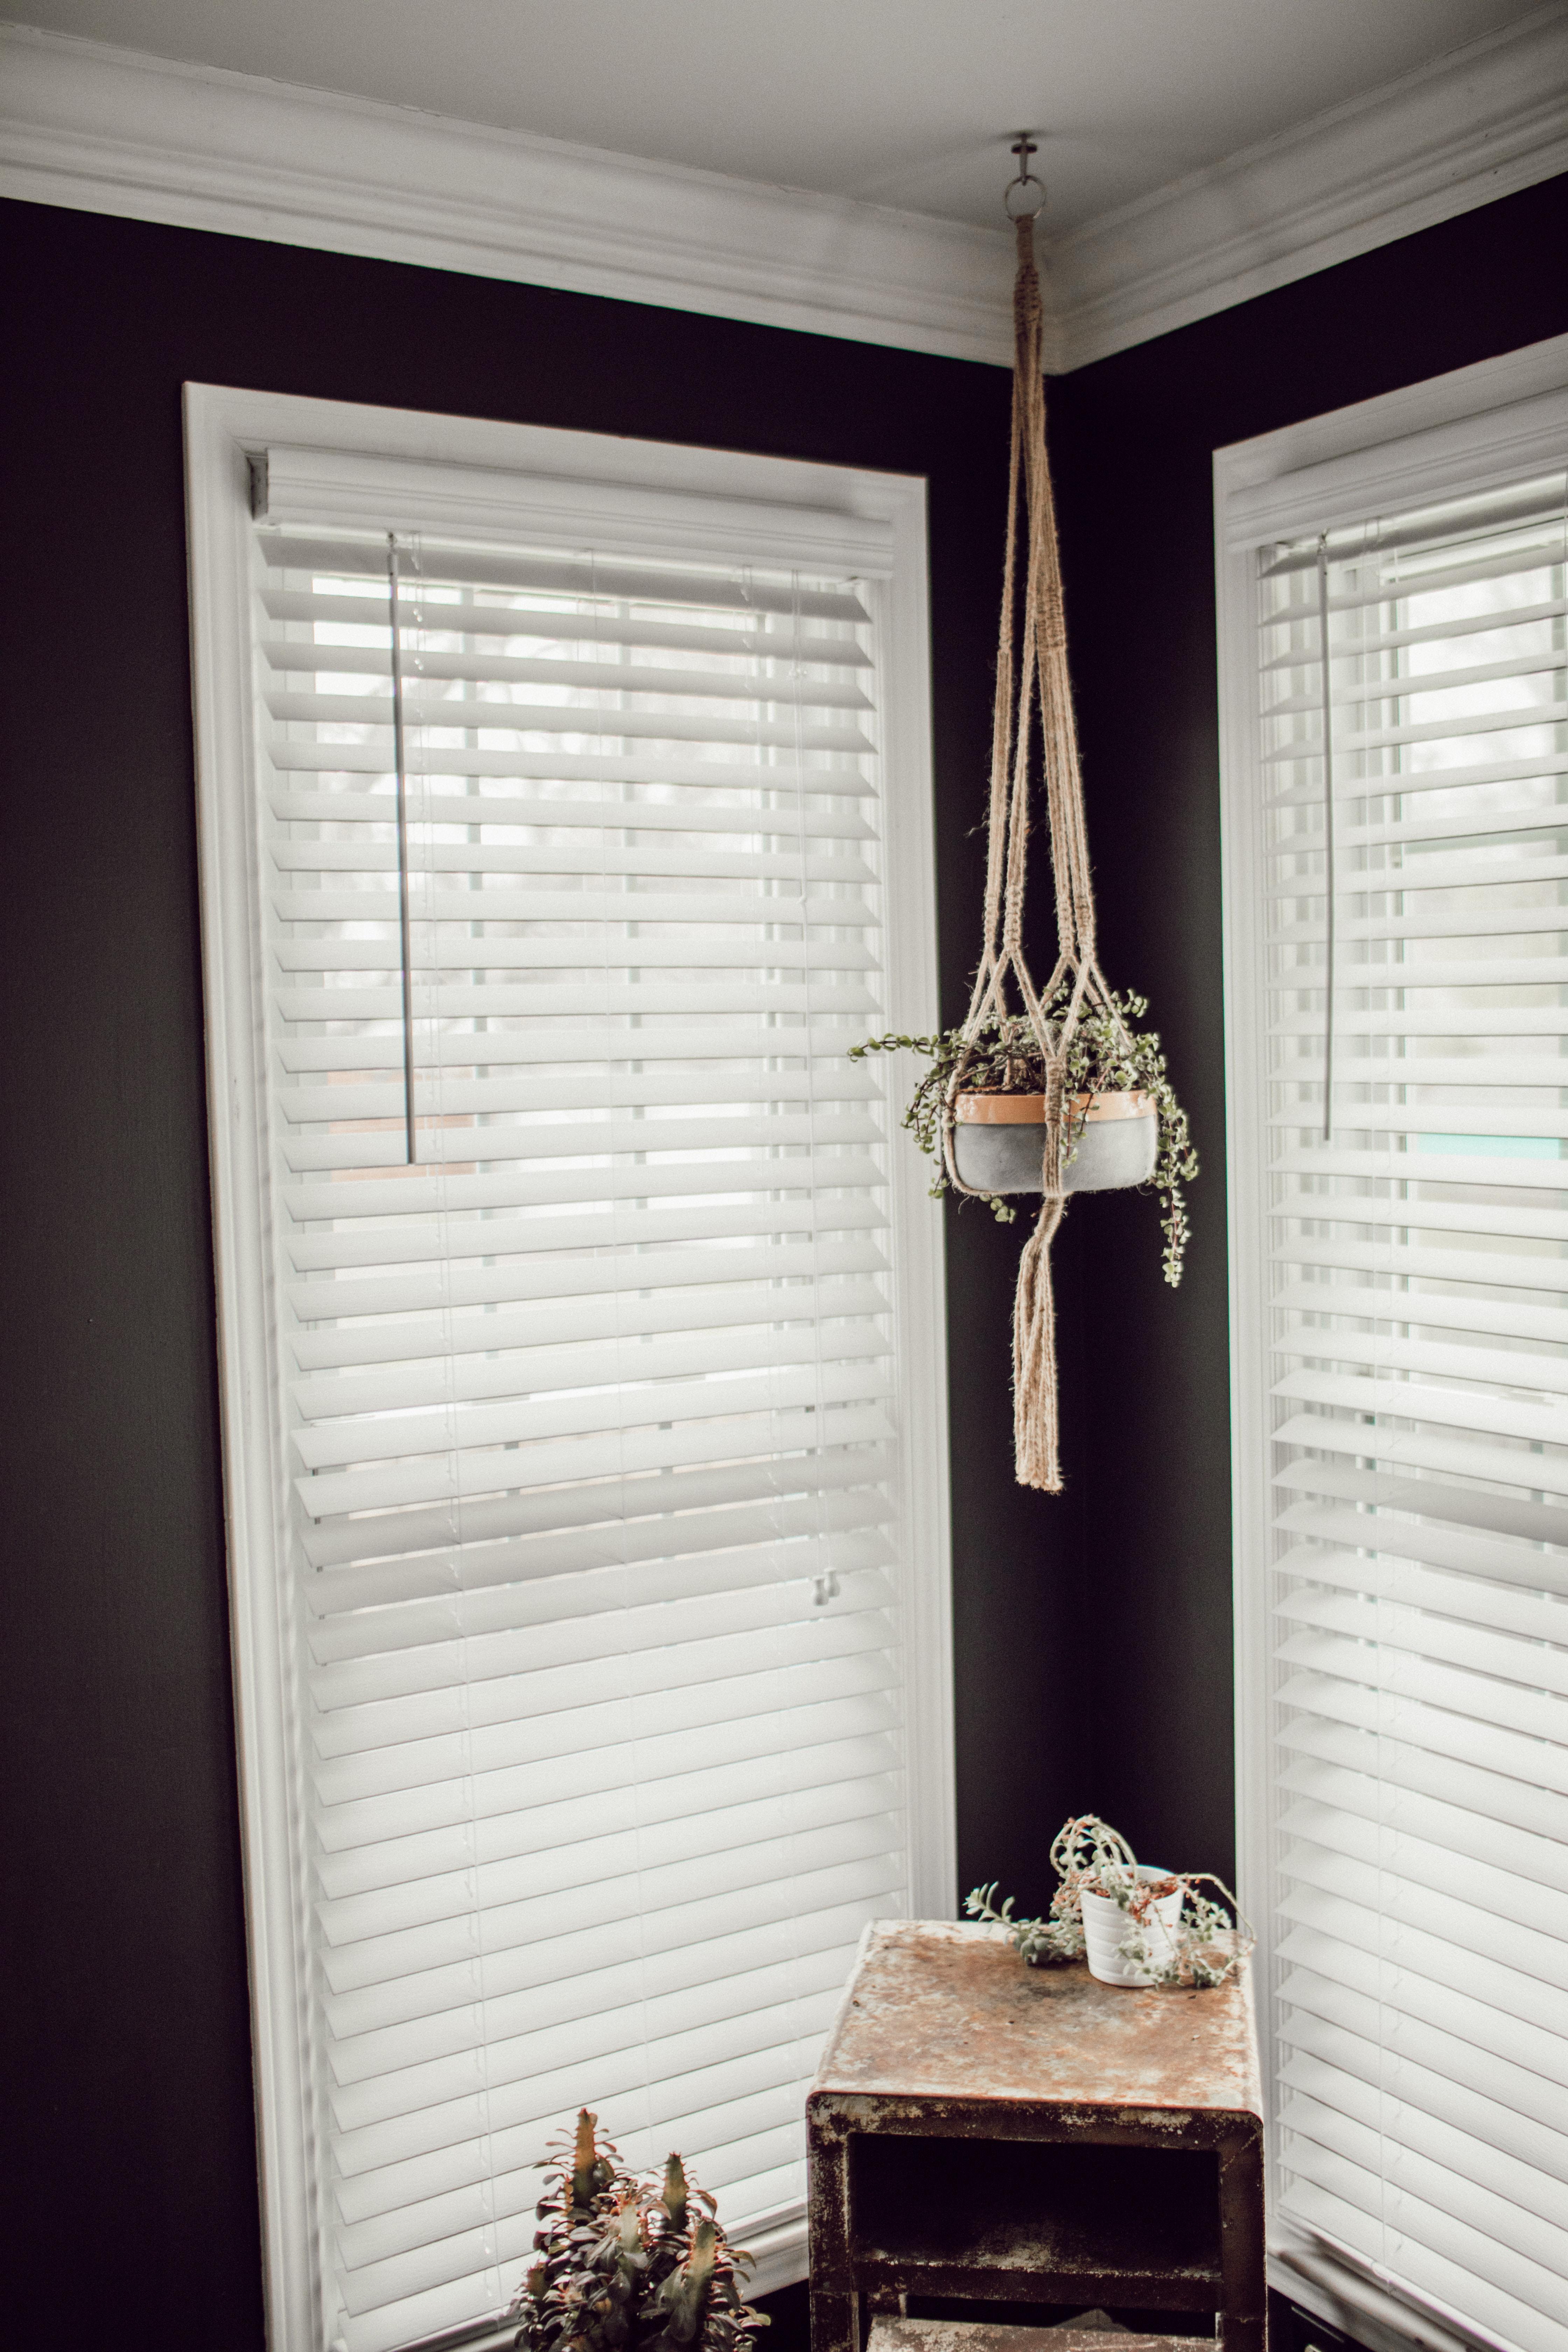 white window blind curtains on glass windows